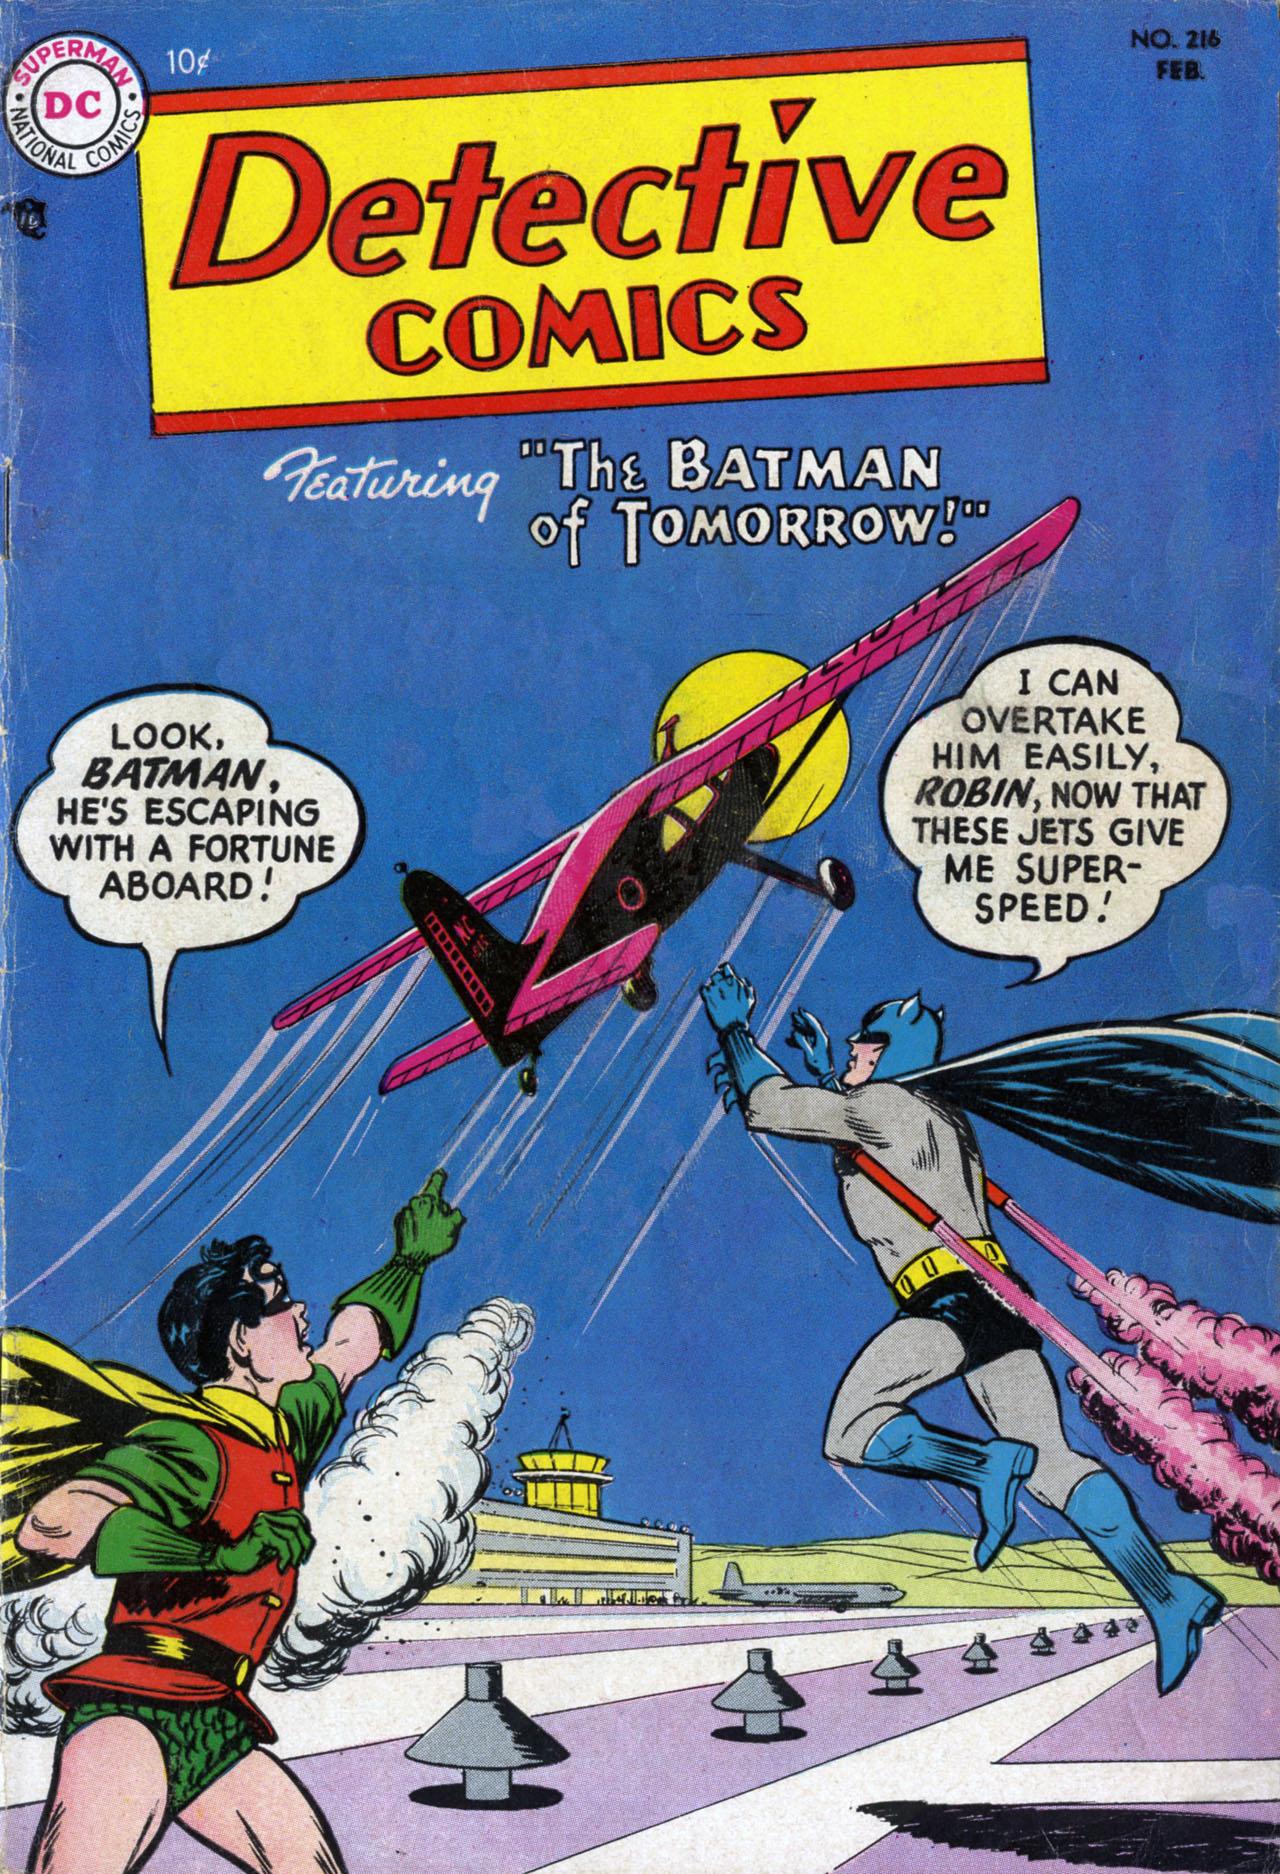 Read online Detective Comics (1937) comic -  Issue #216 - 1